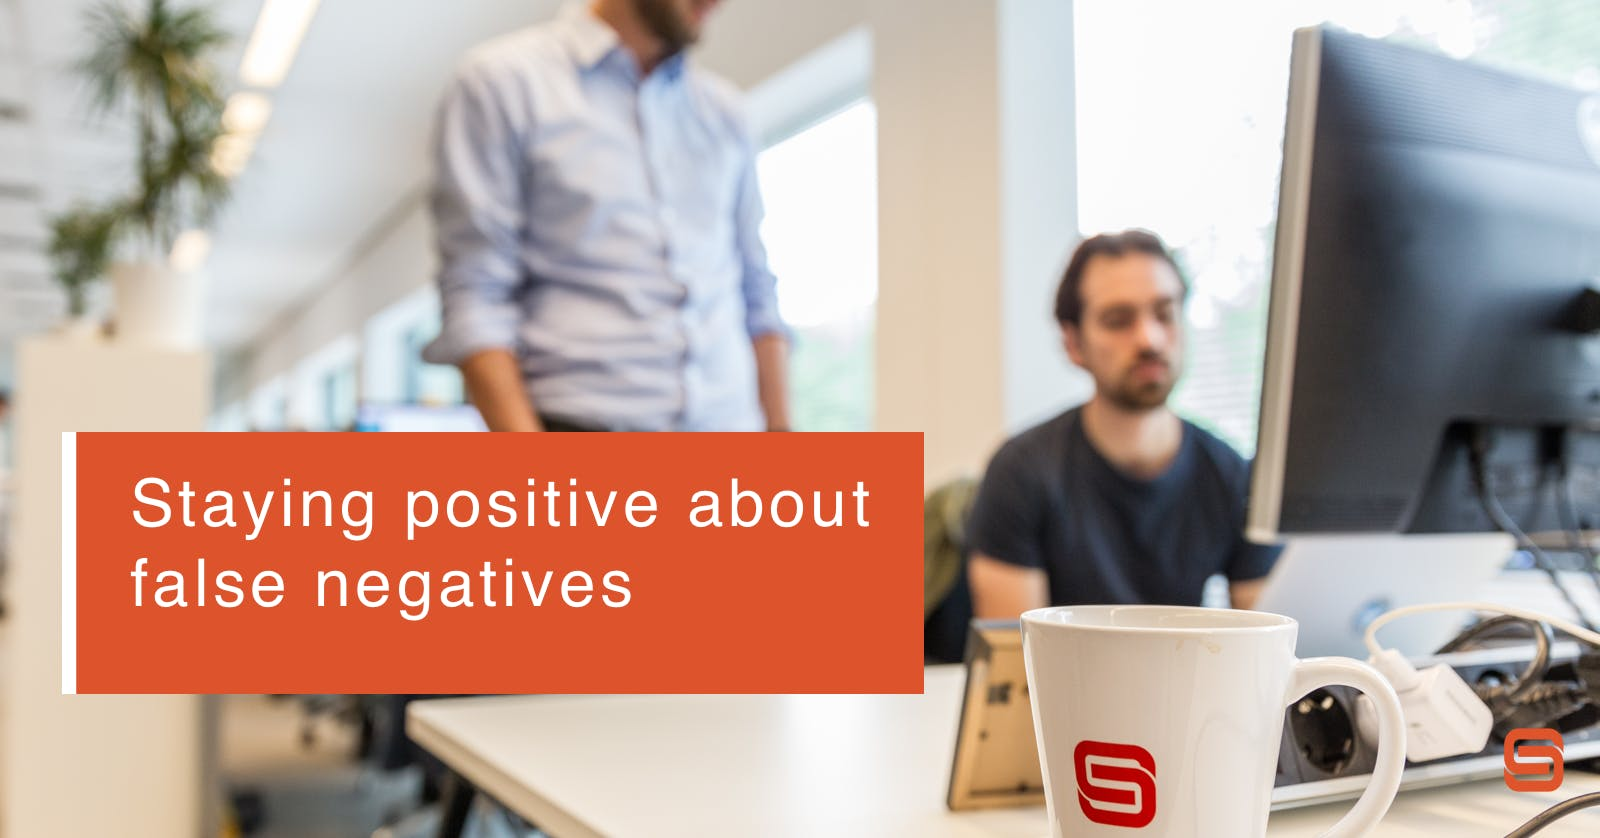 Staying positive about false negatives